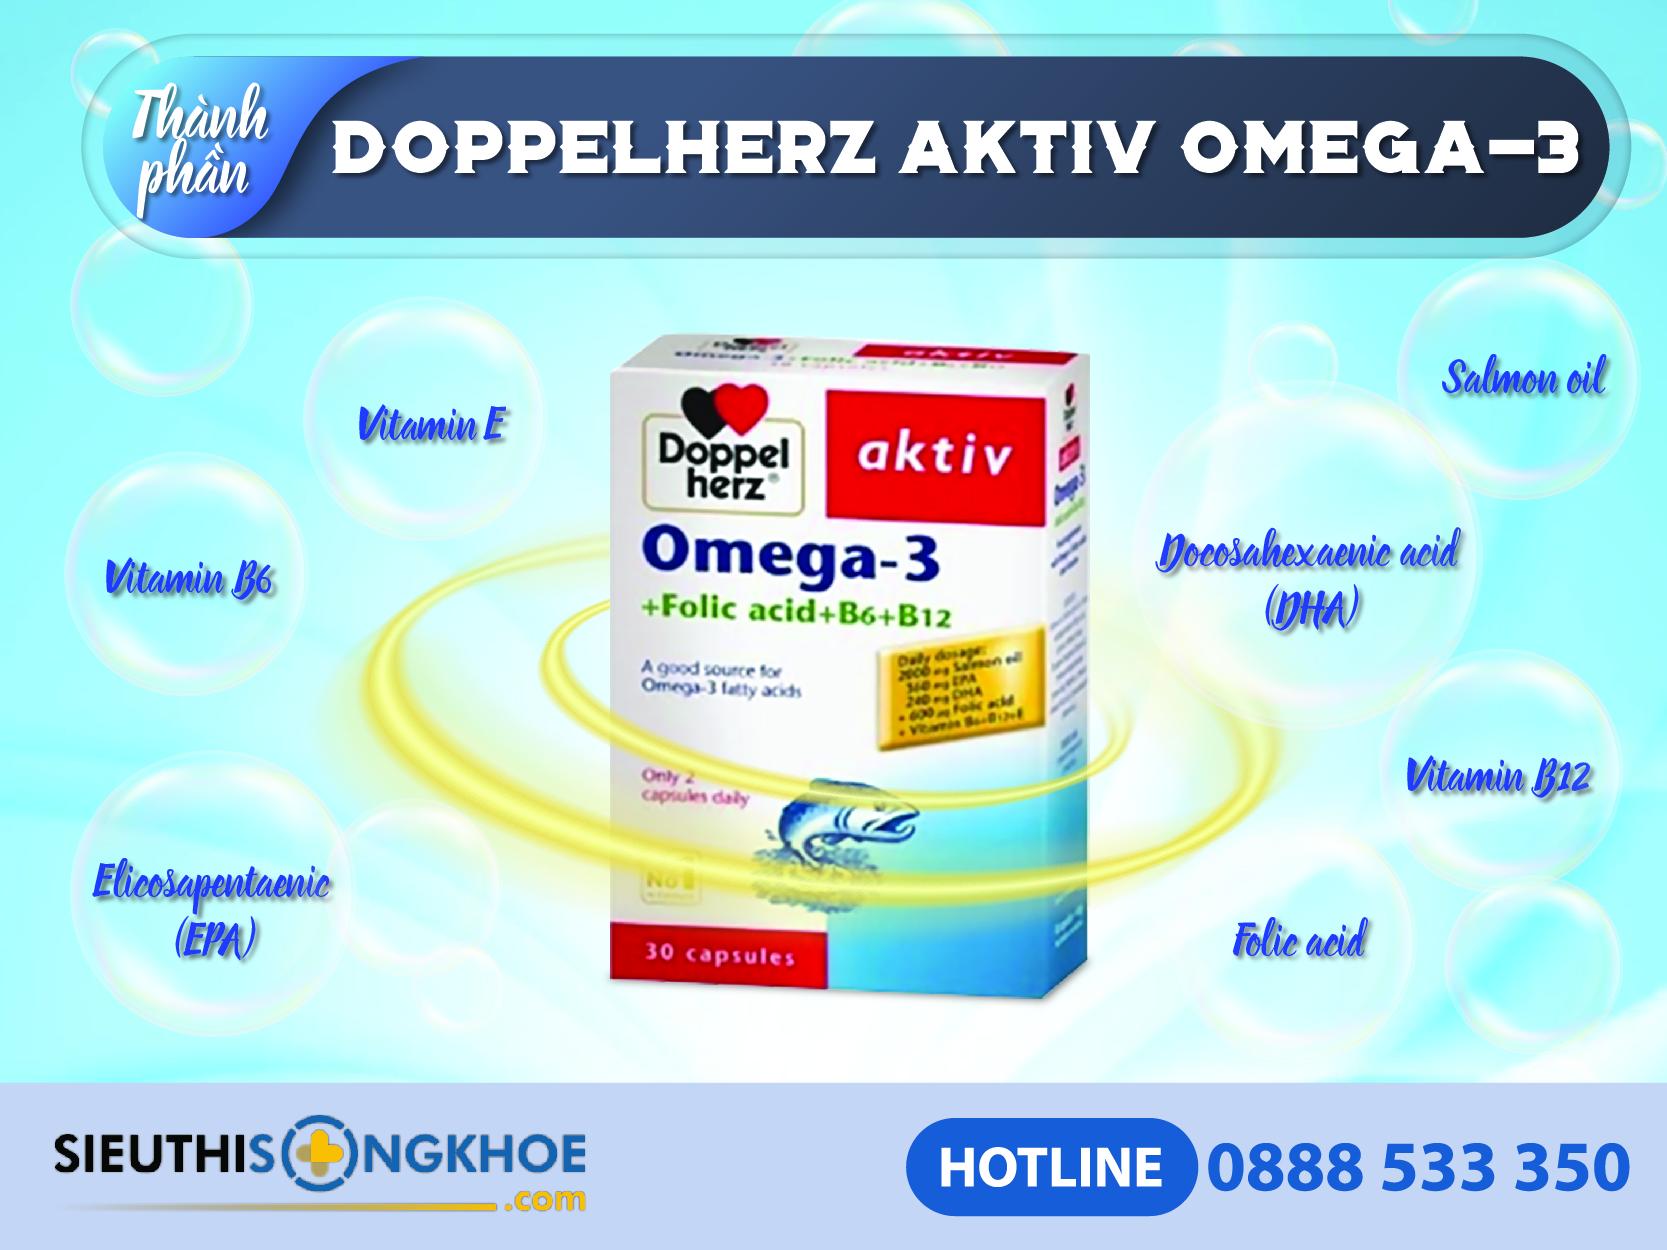 thanh phan dau ca doppelherz aktiv omega 3